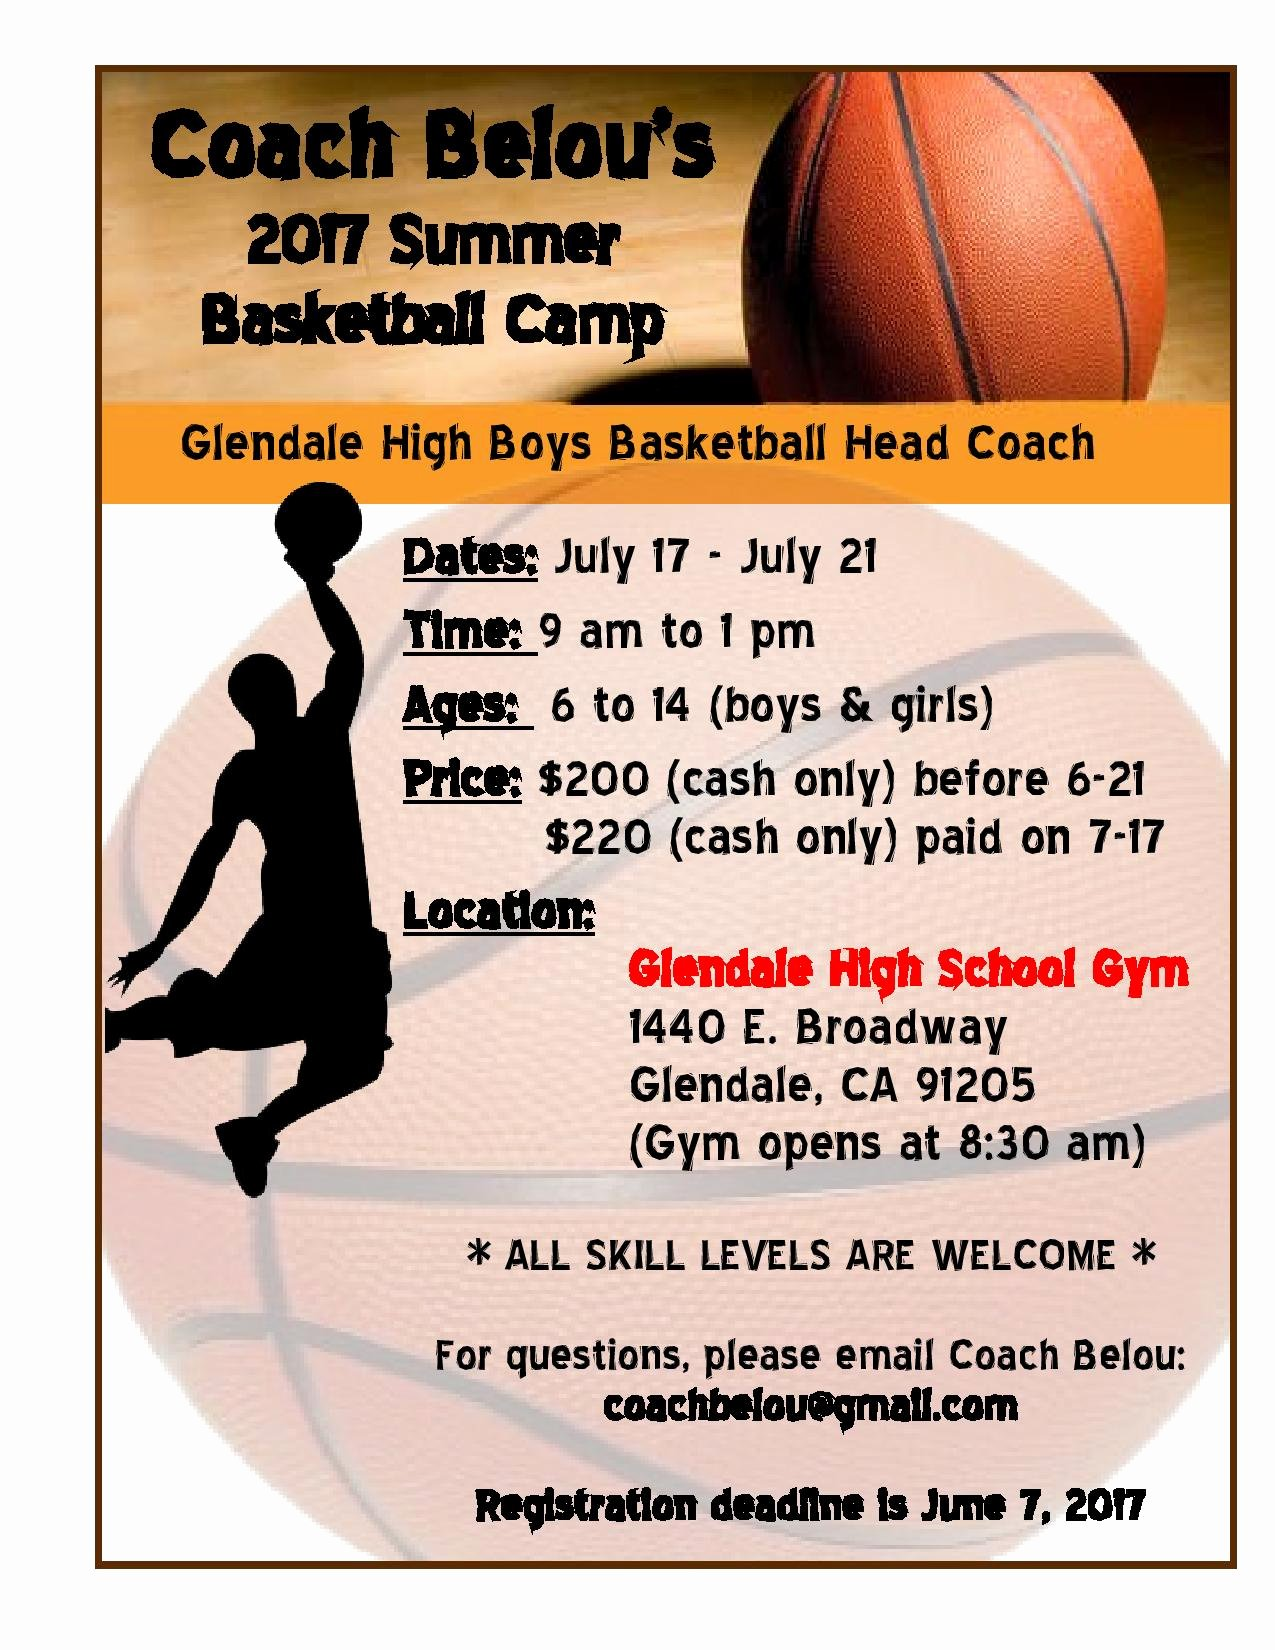 Basketball Camp Flyer Template Luxury Coach Belou S Summer Basketball Camp Full force Basketball